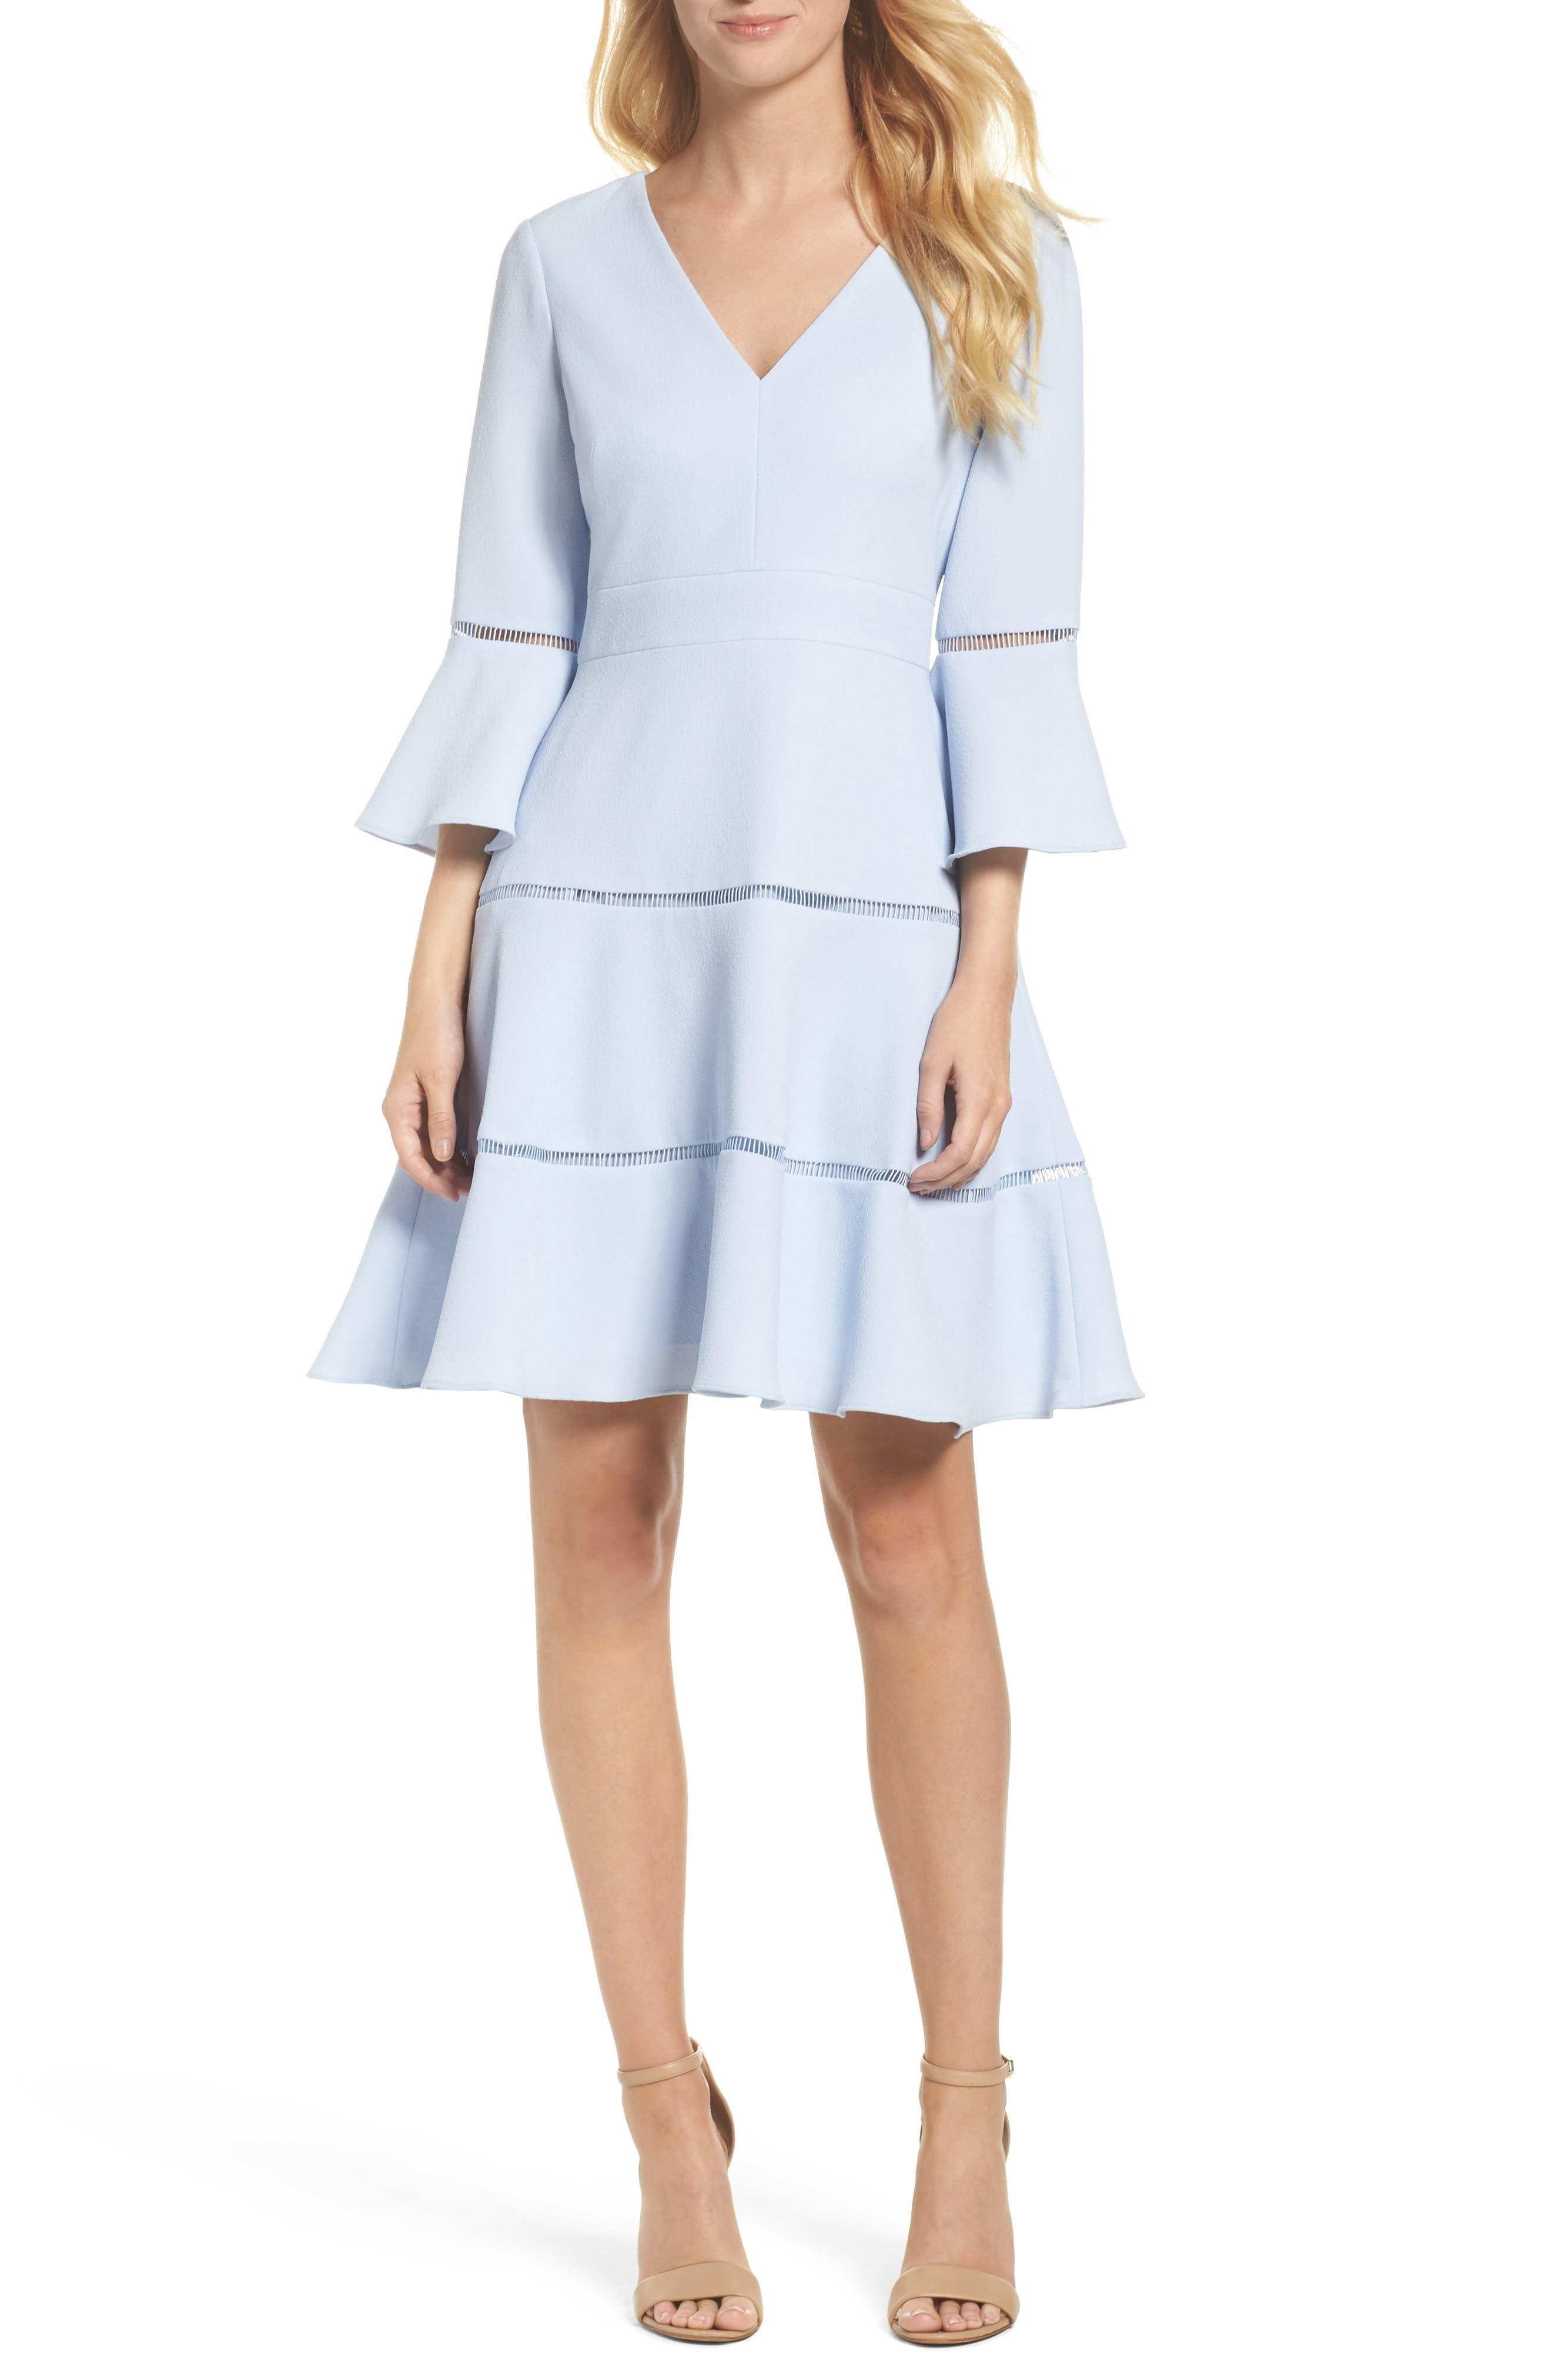 Main Image - Eliza J Lace Inset Fit & Flare Dress (Regular & Petite)